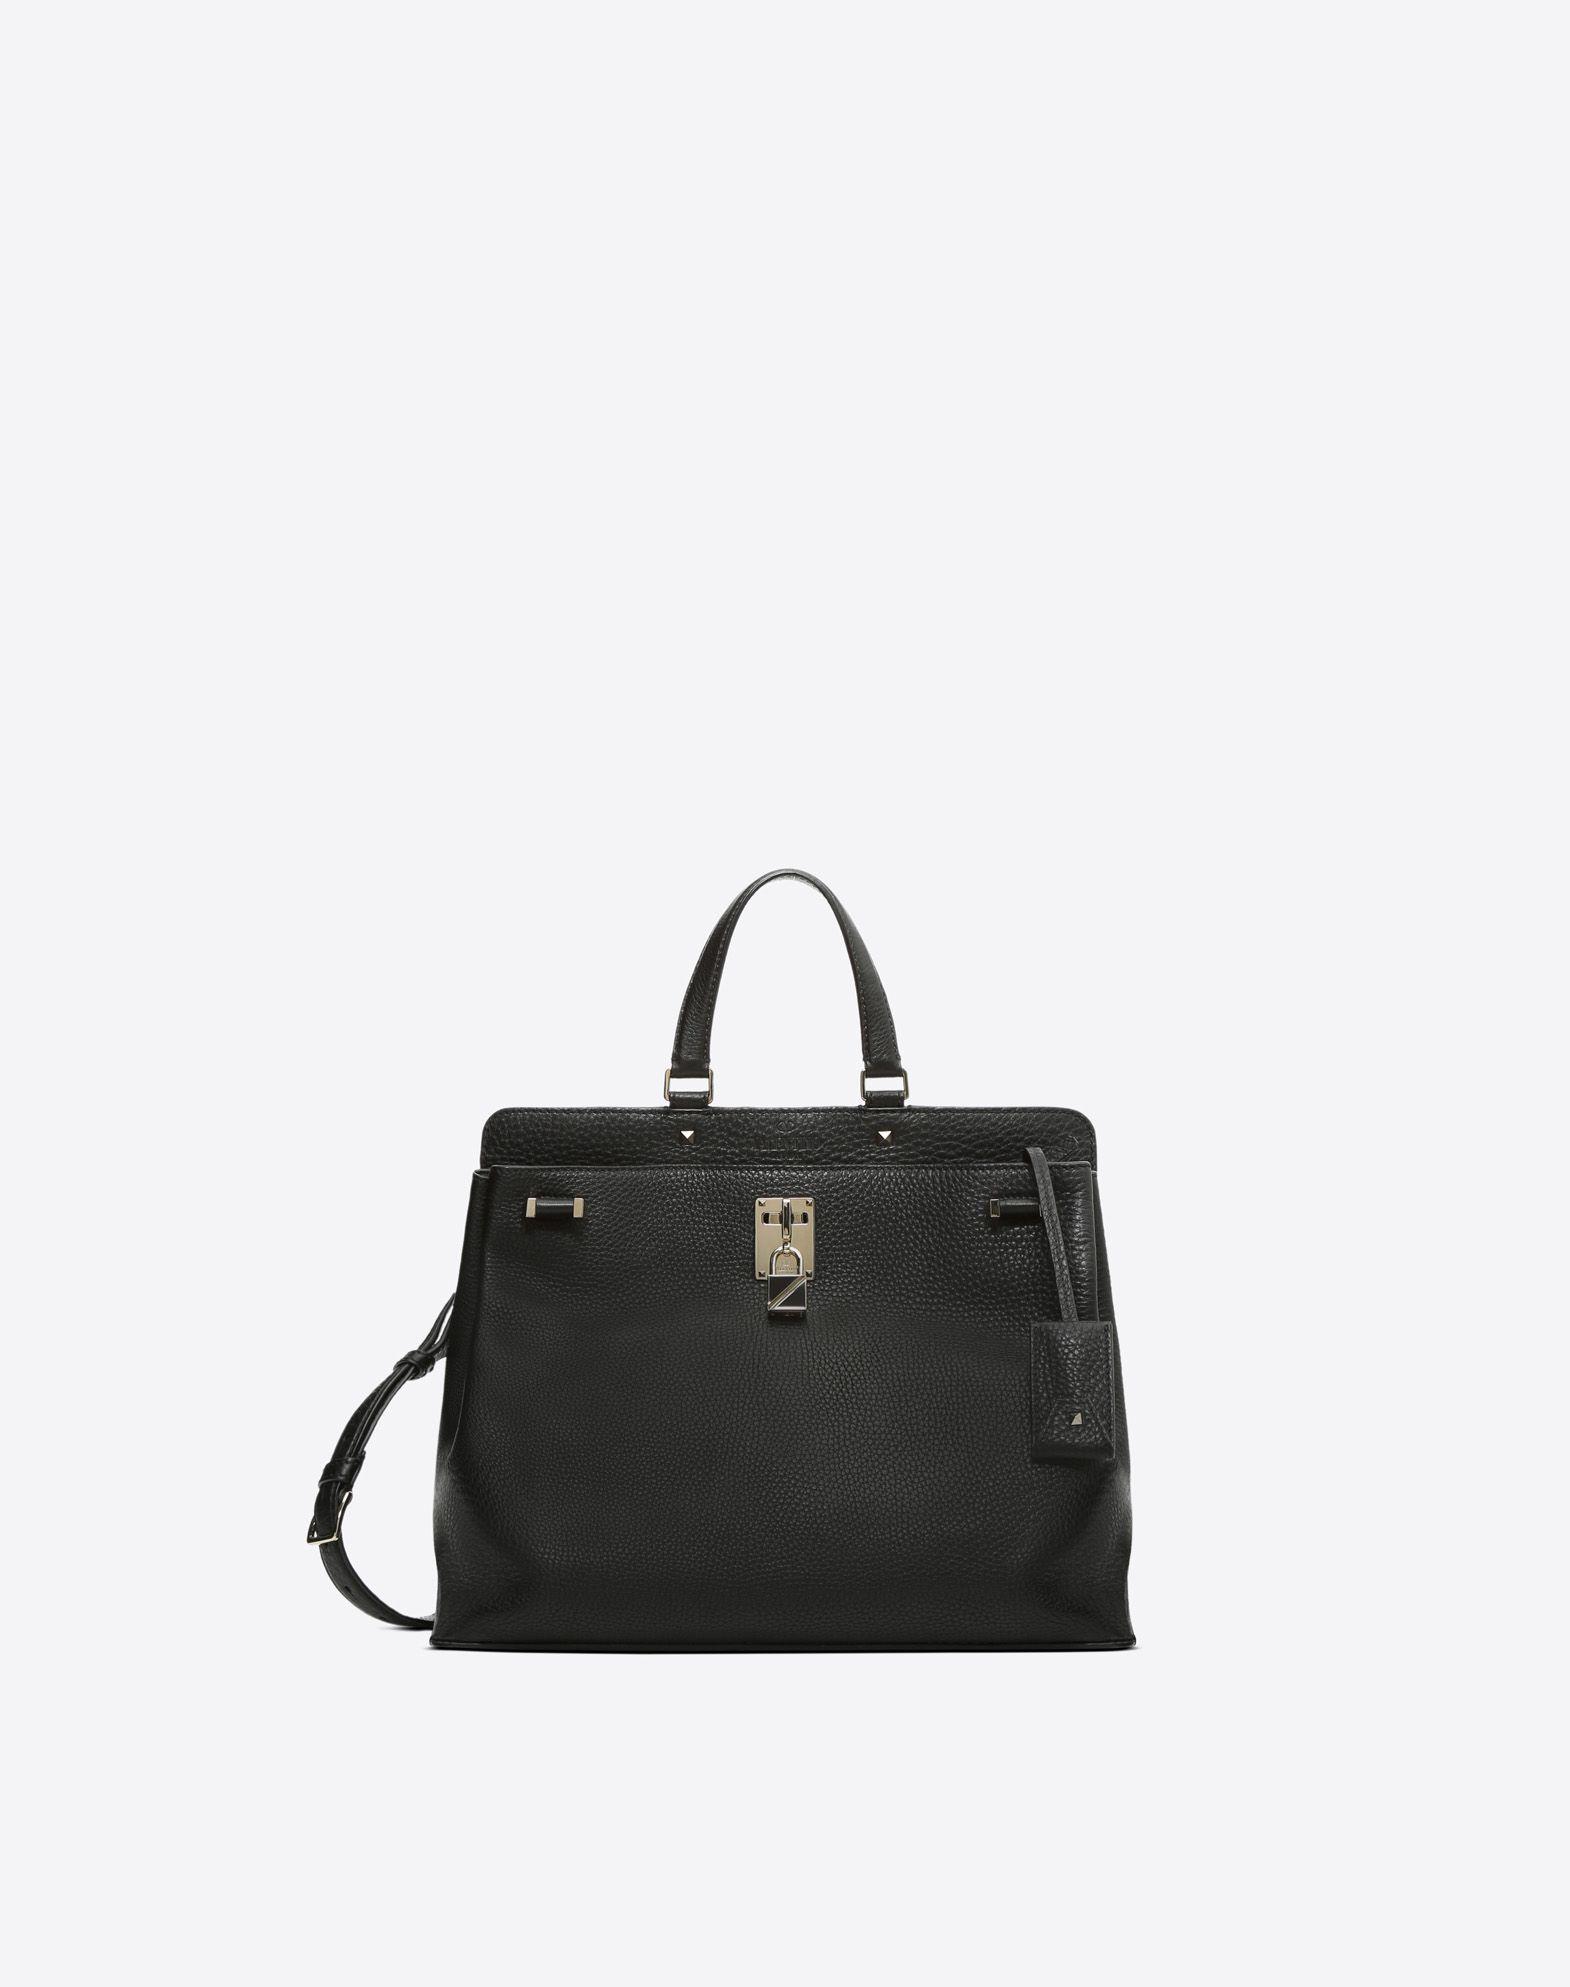 VALENTINO GARAVANI Joylock Handbag HANDBAG D f